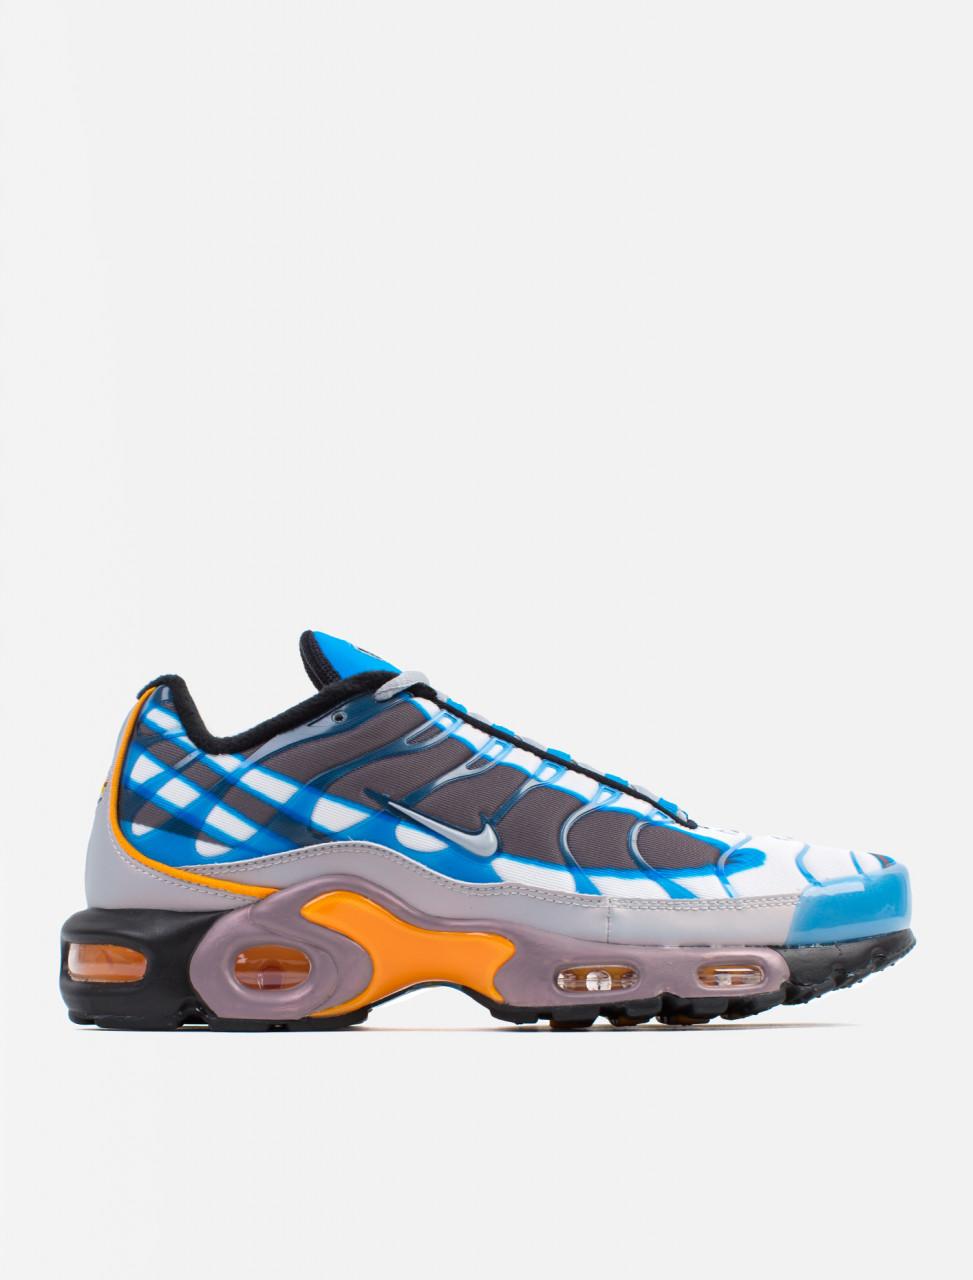 Air Max Plus Premium Sneaker